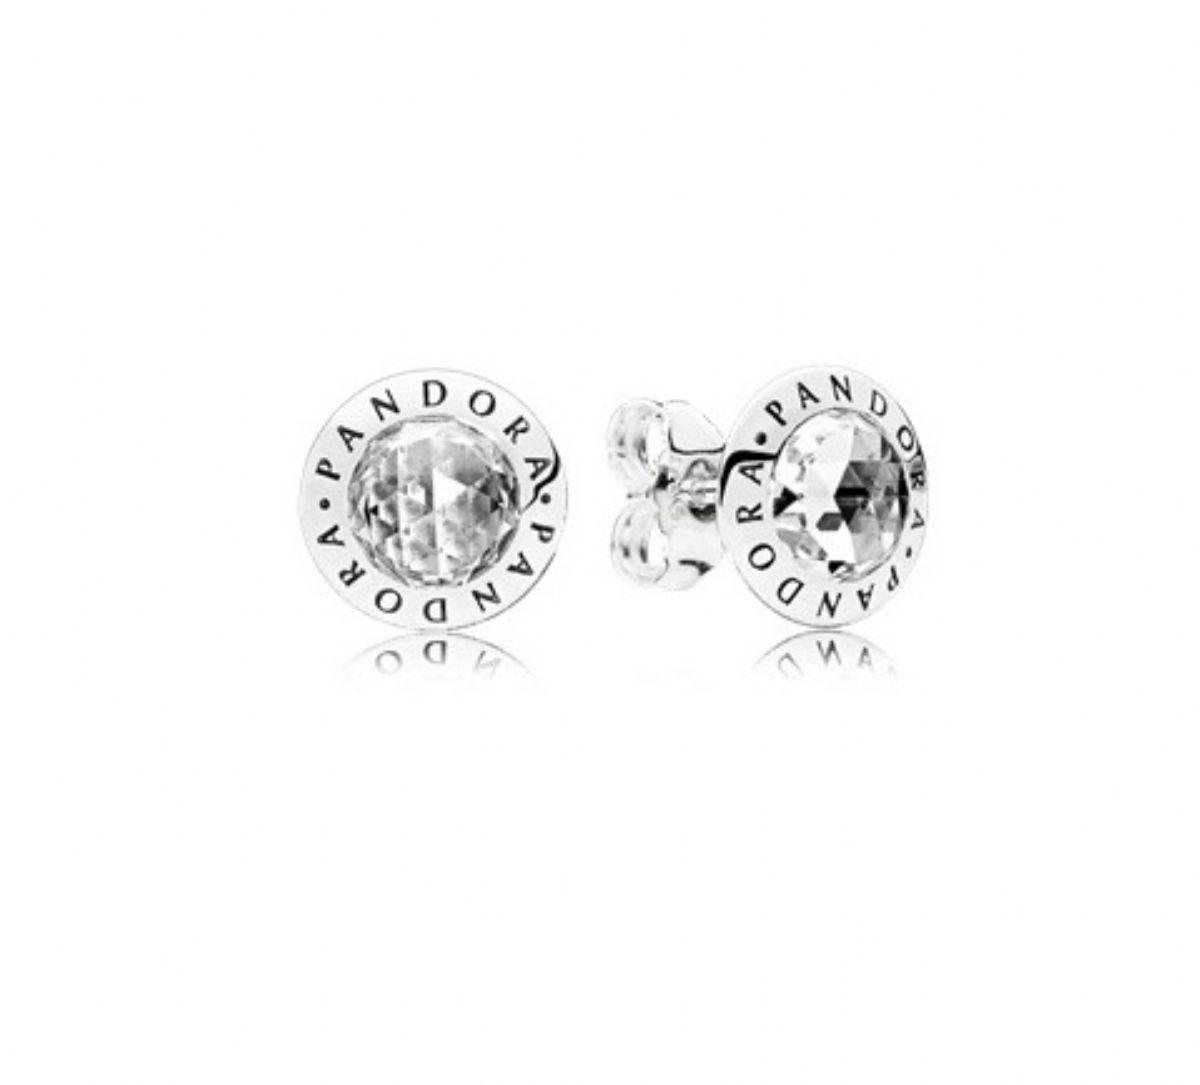 ... Stříbrné náušnice Pandora - Zářivé logo PANDORA 1 2 ... 8cc0739d17e